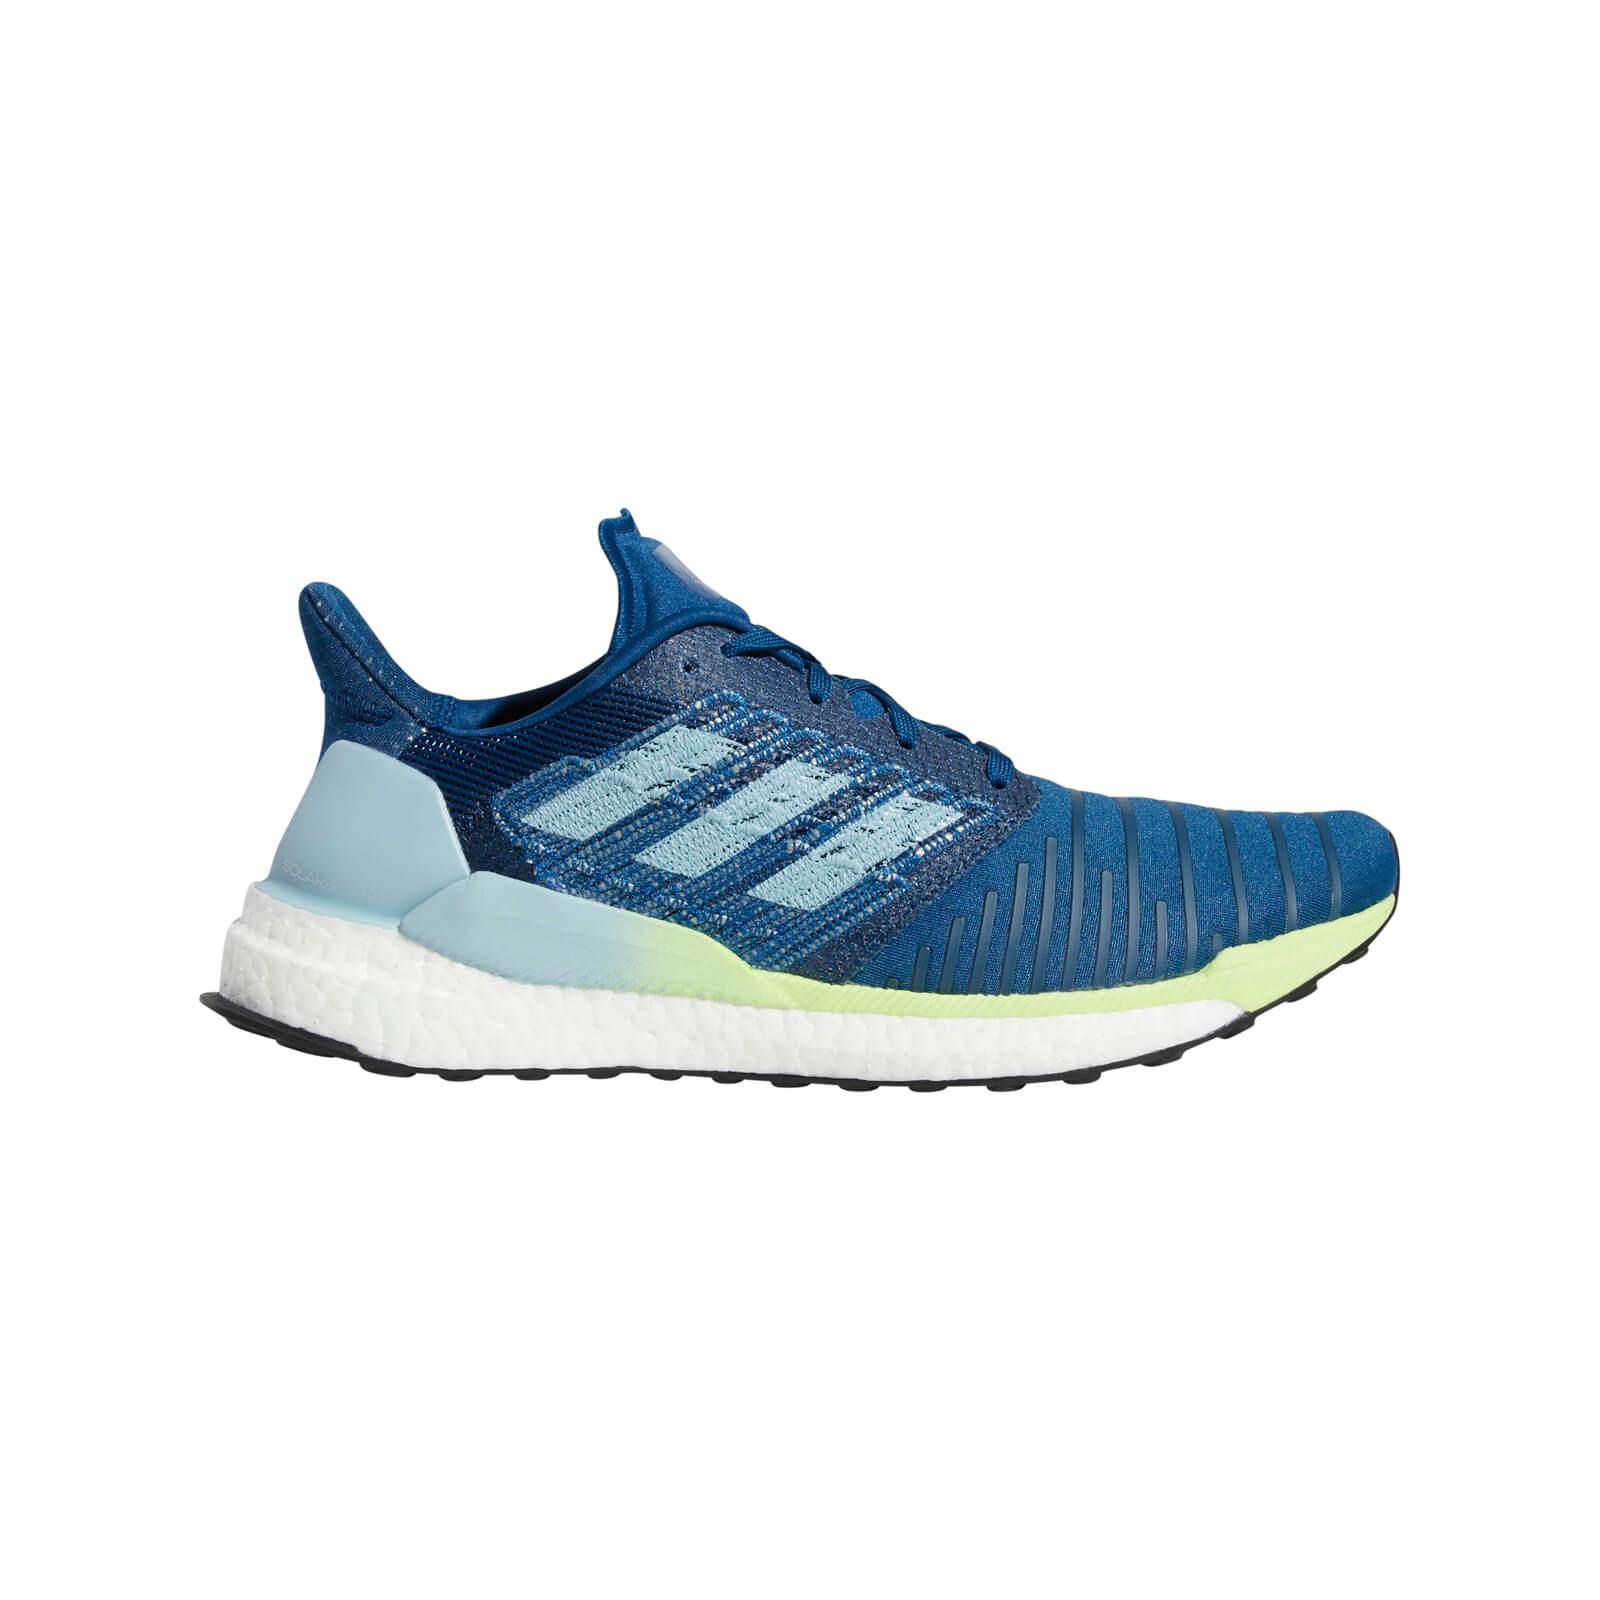 adidas Men's Solar Boost Running Shoes - Blue - US 8.5/UK 8 - Blue